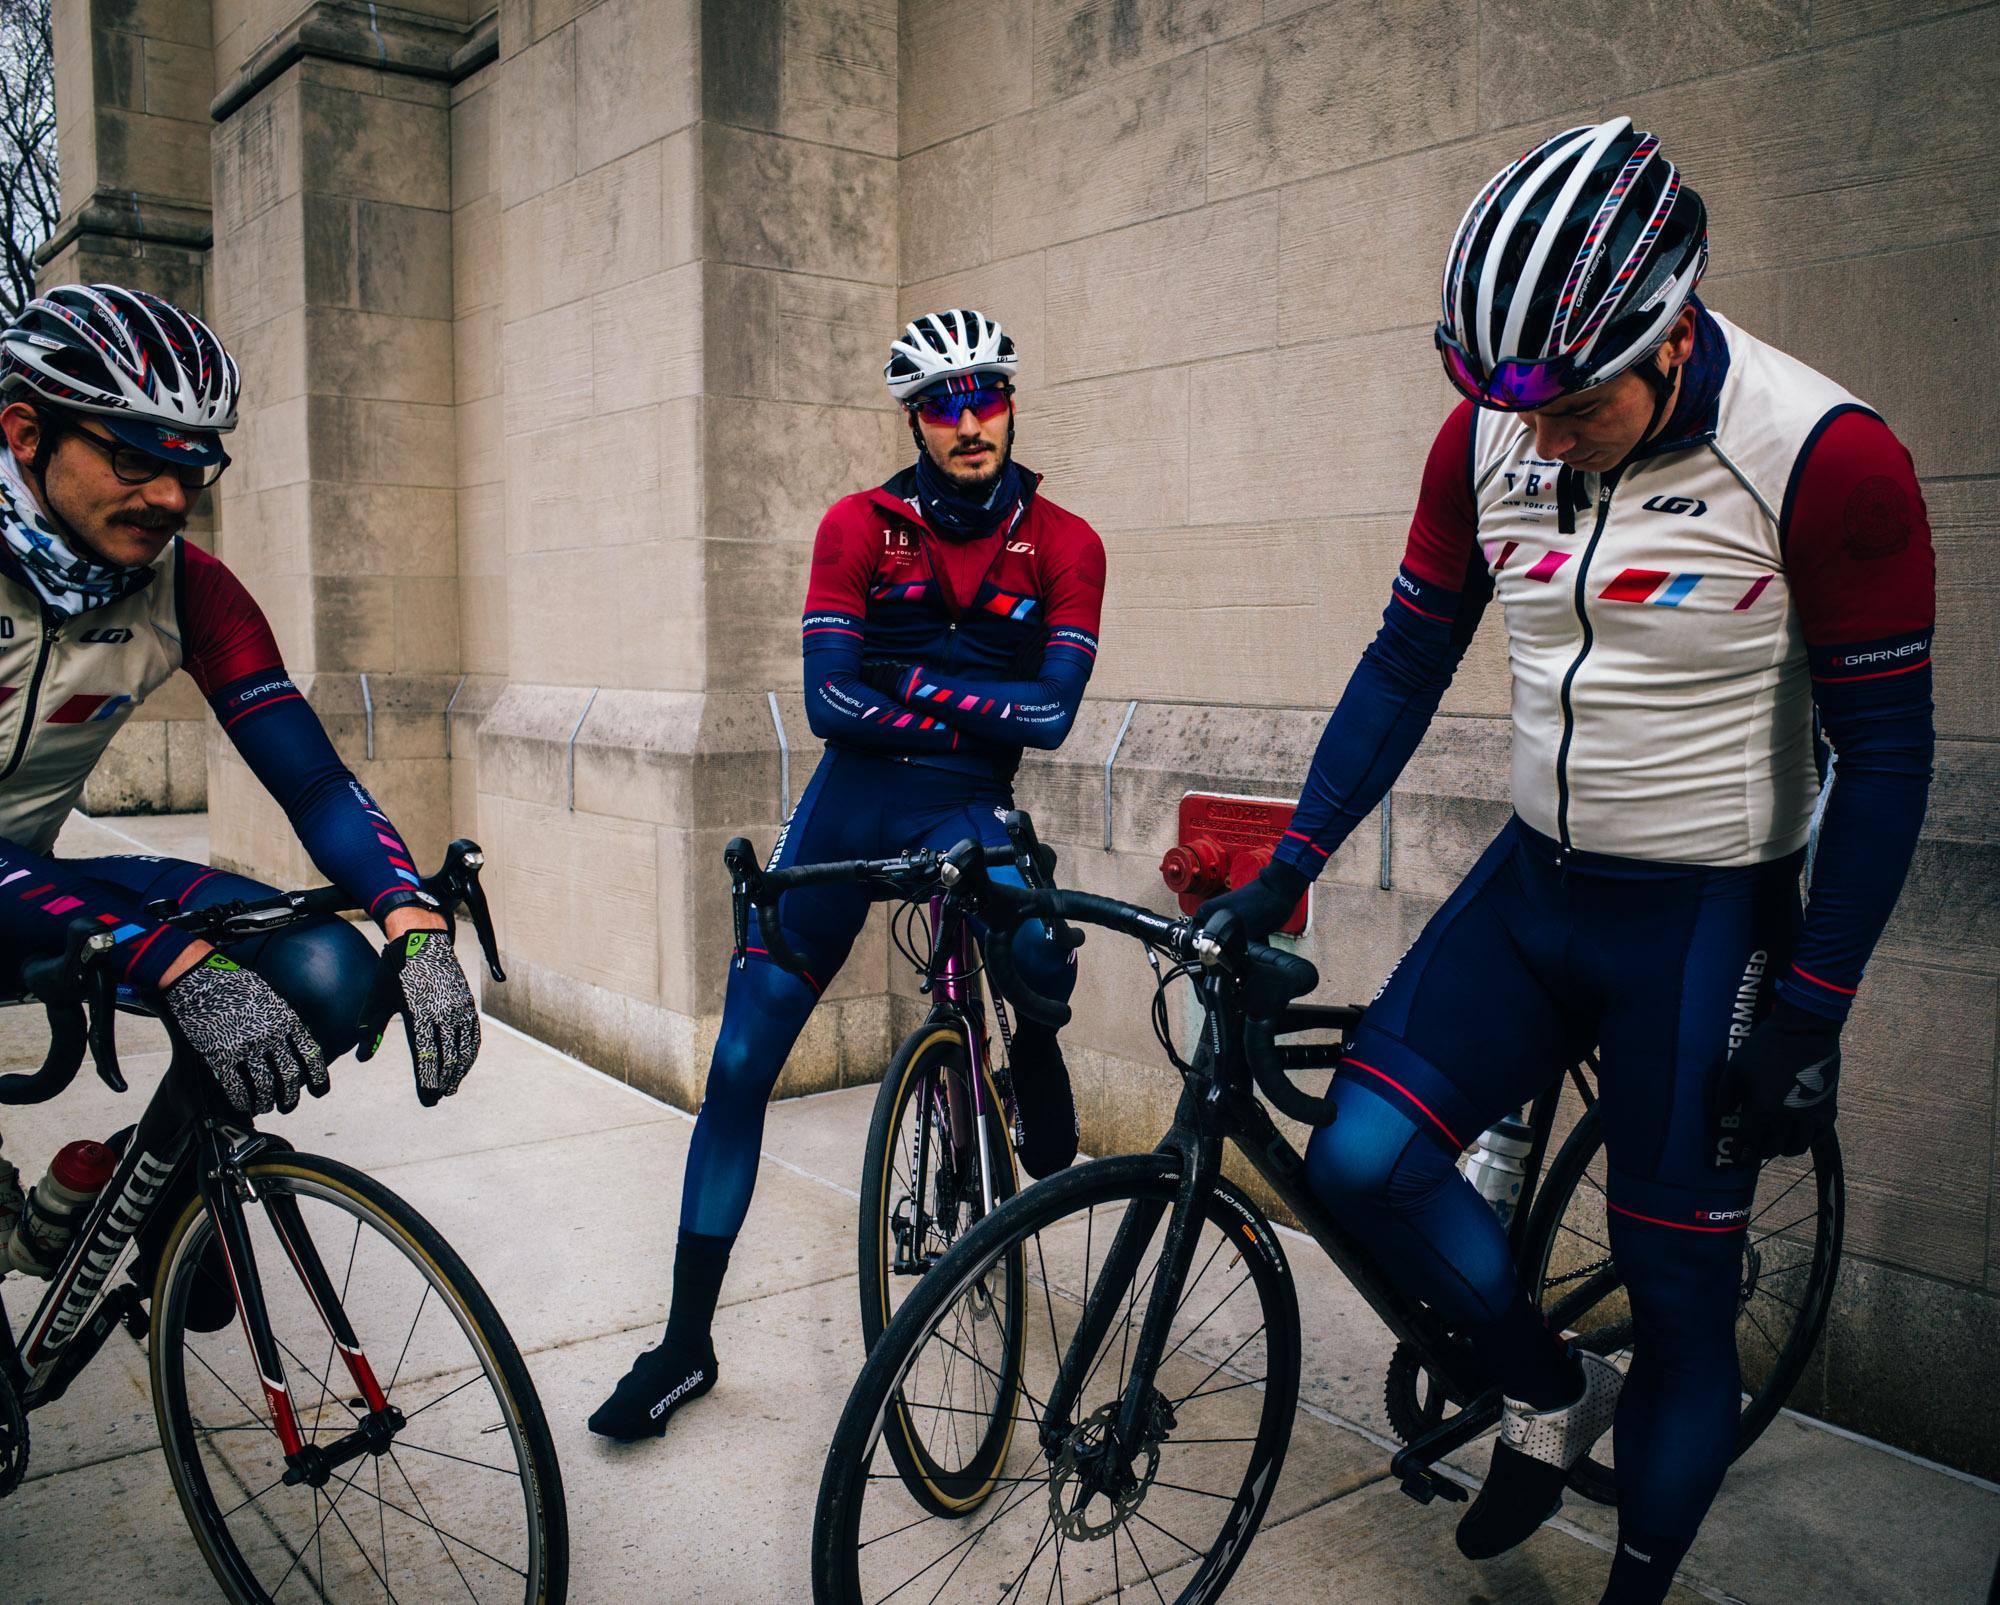 to-be-determined-photo-rhetoric-weekend-roll-lisa-bday-ride-100.jpg